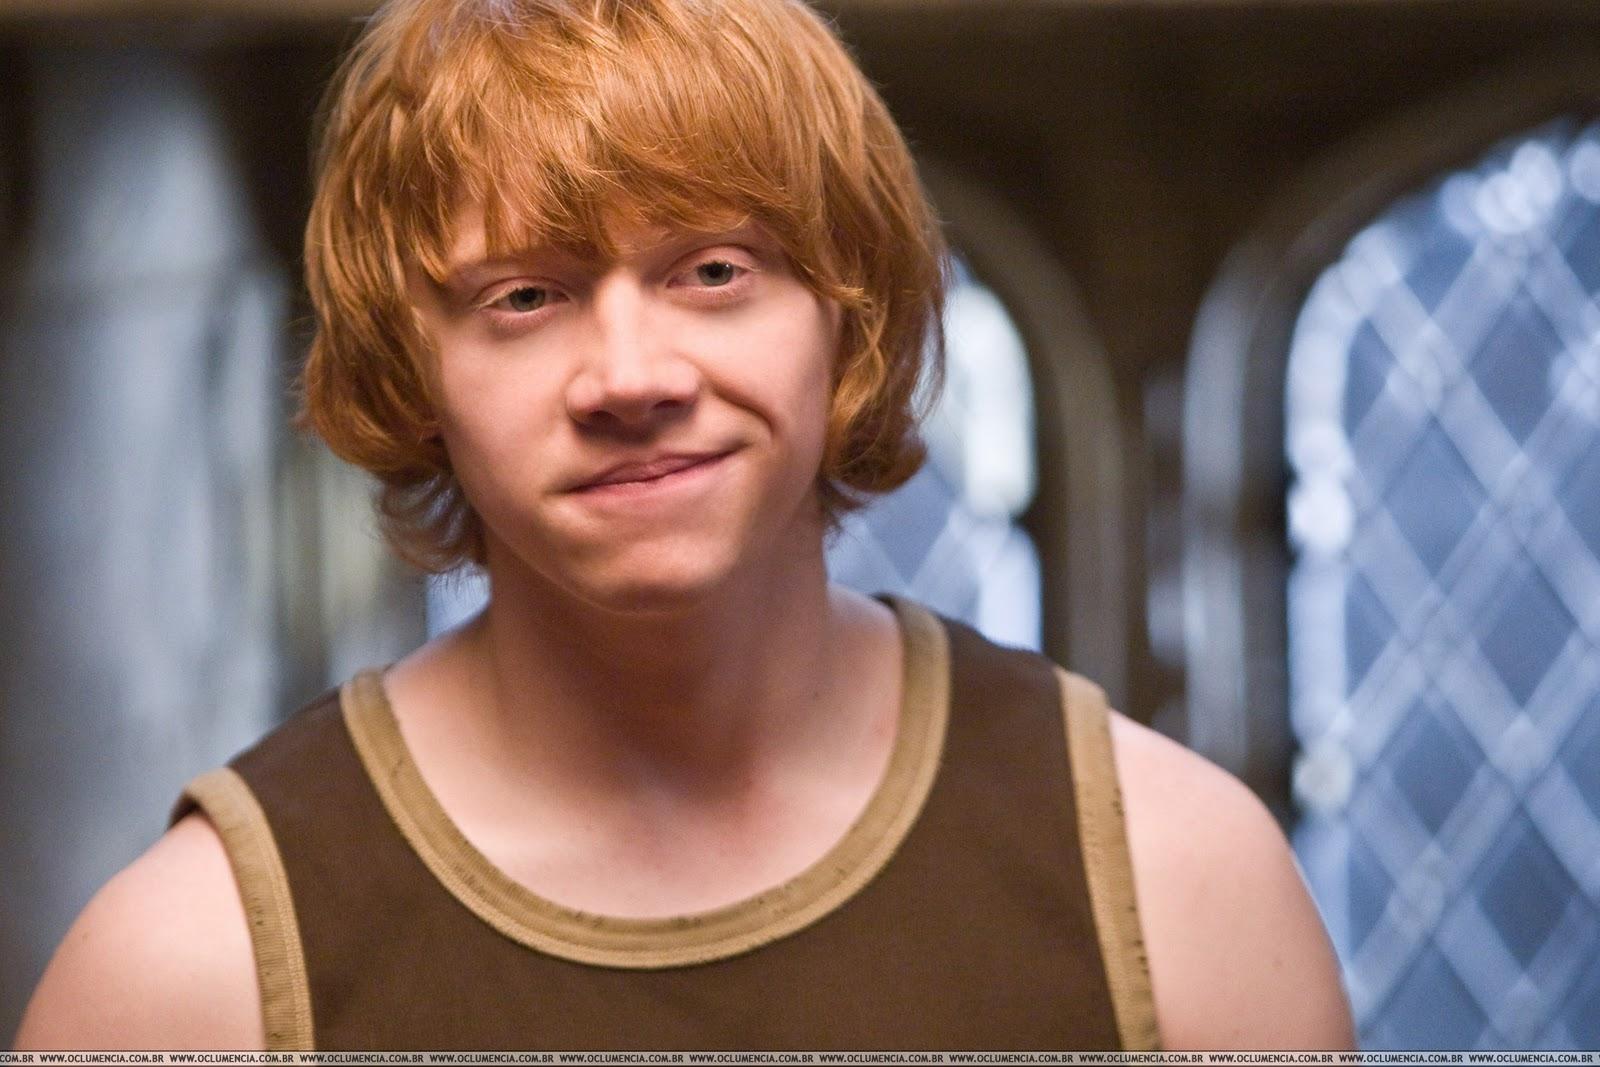 http://2.bp.blogspot.com/-IWYiSvB04UY/TZxPSj-j8UI/AAAAAAAAAj4/EbVmNq2rKqM/s1600/Rupert+Grint+in+Harry+Potter+as+Ron+Weasley+%252810%2529.jpg